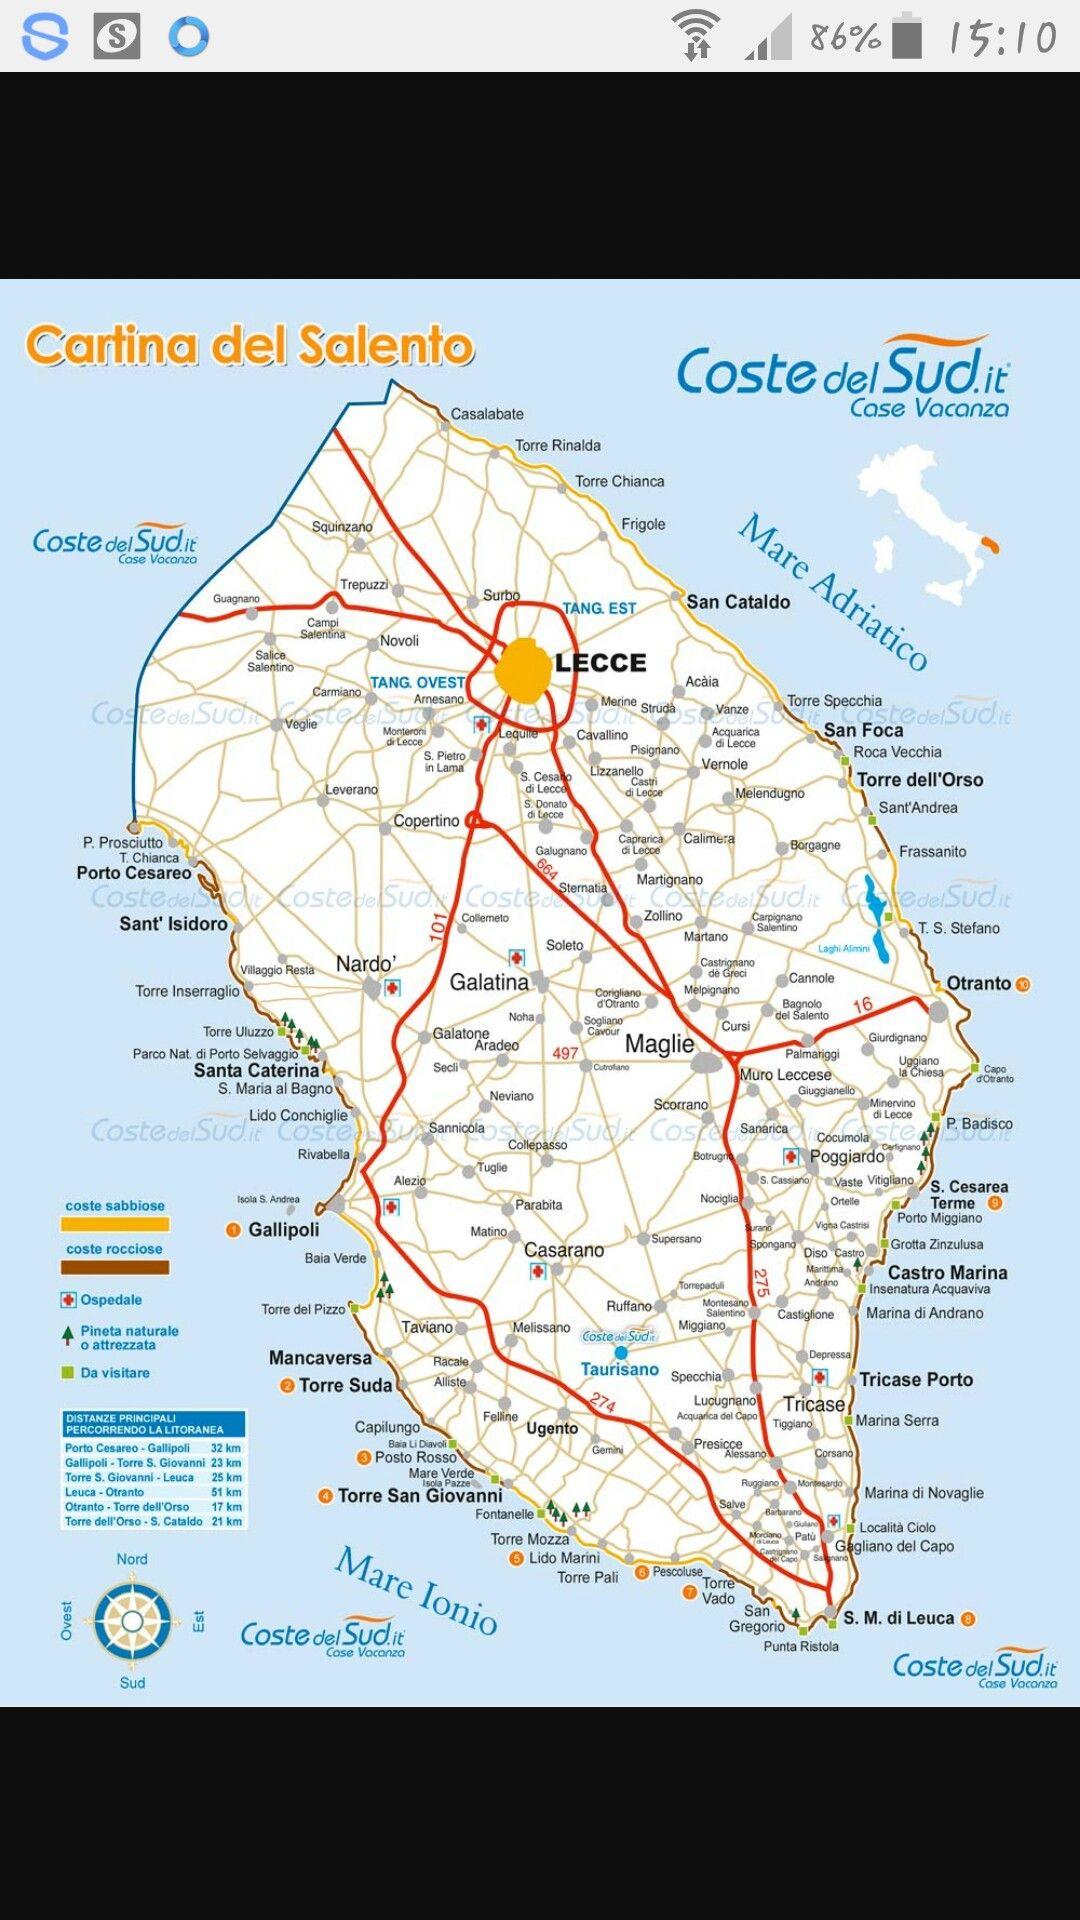 Cartina Puglia Salento.Cartina Del Salento Puglia Salento Italy Travel